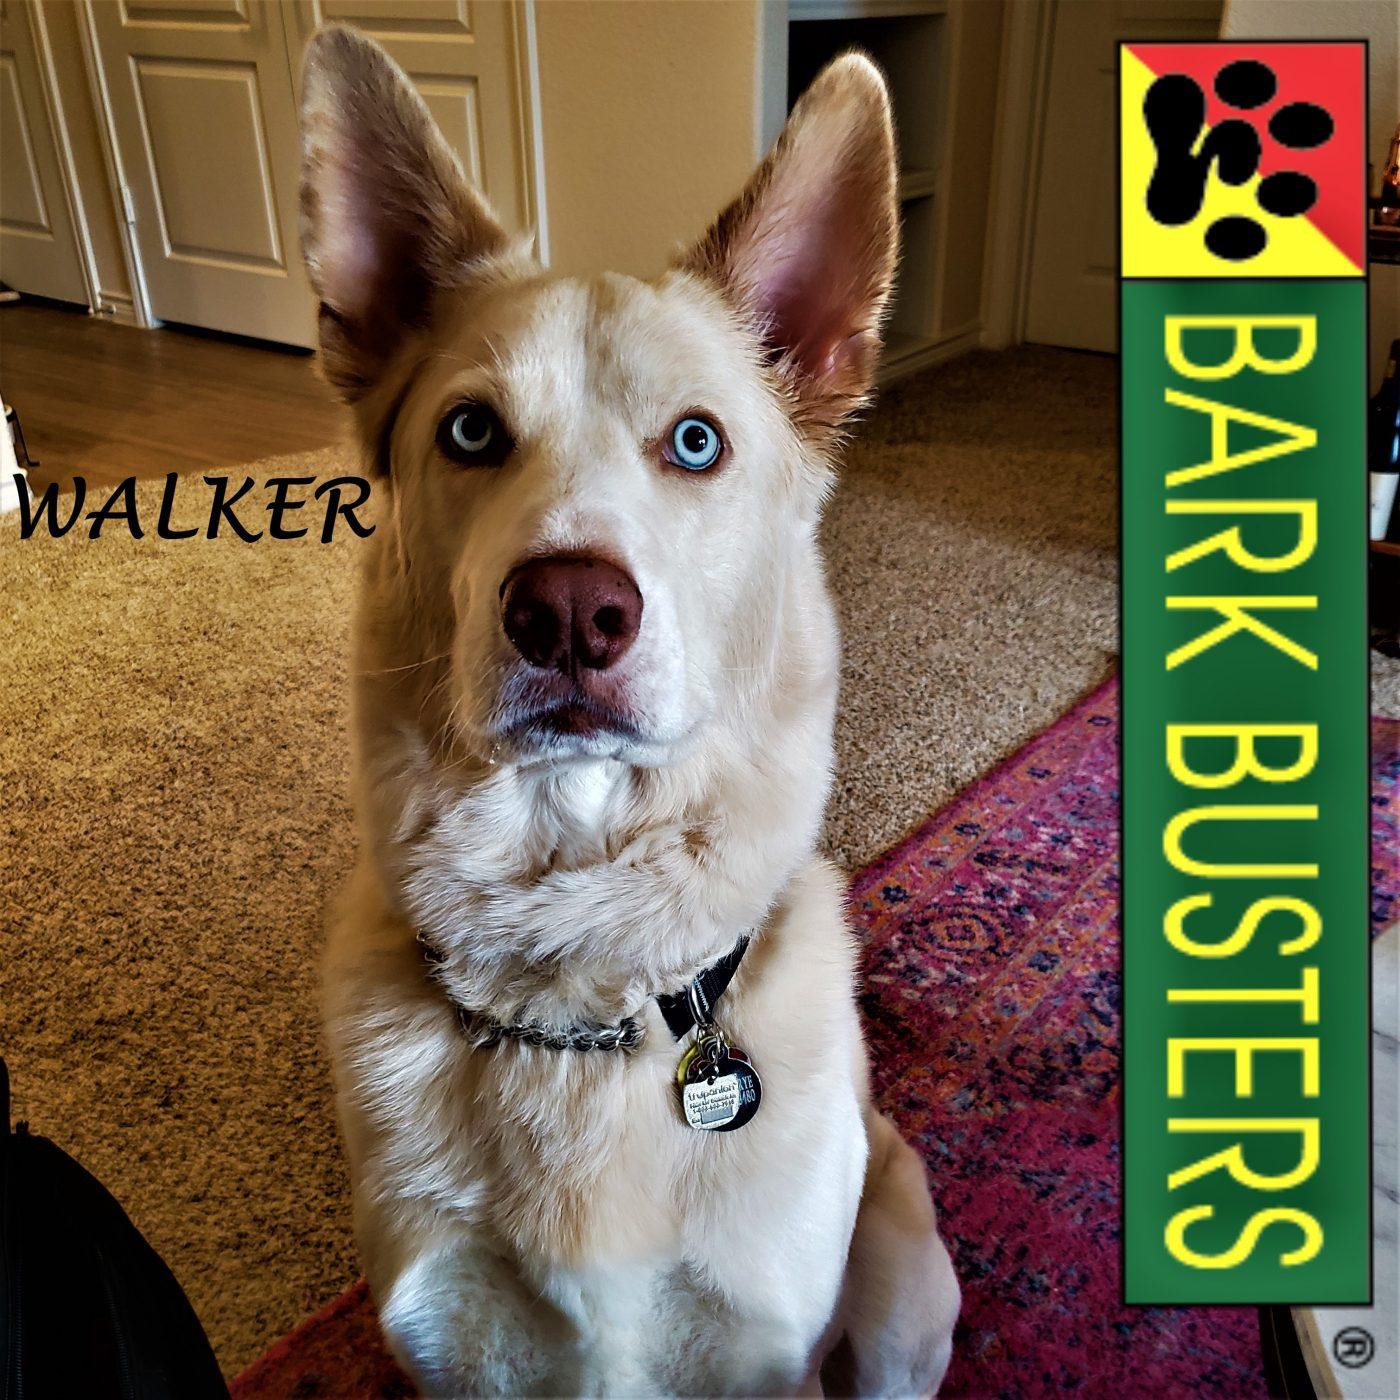 #husky #leashtraining #blueeyeddog #dogtrainingaustin #dogtrainernearme #speakdogchangeyourlife #barkbusters